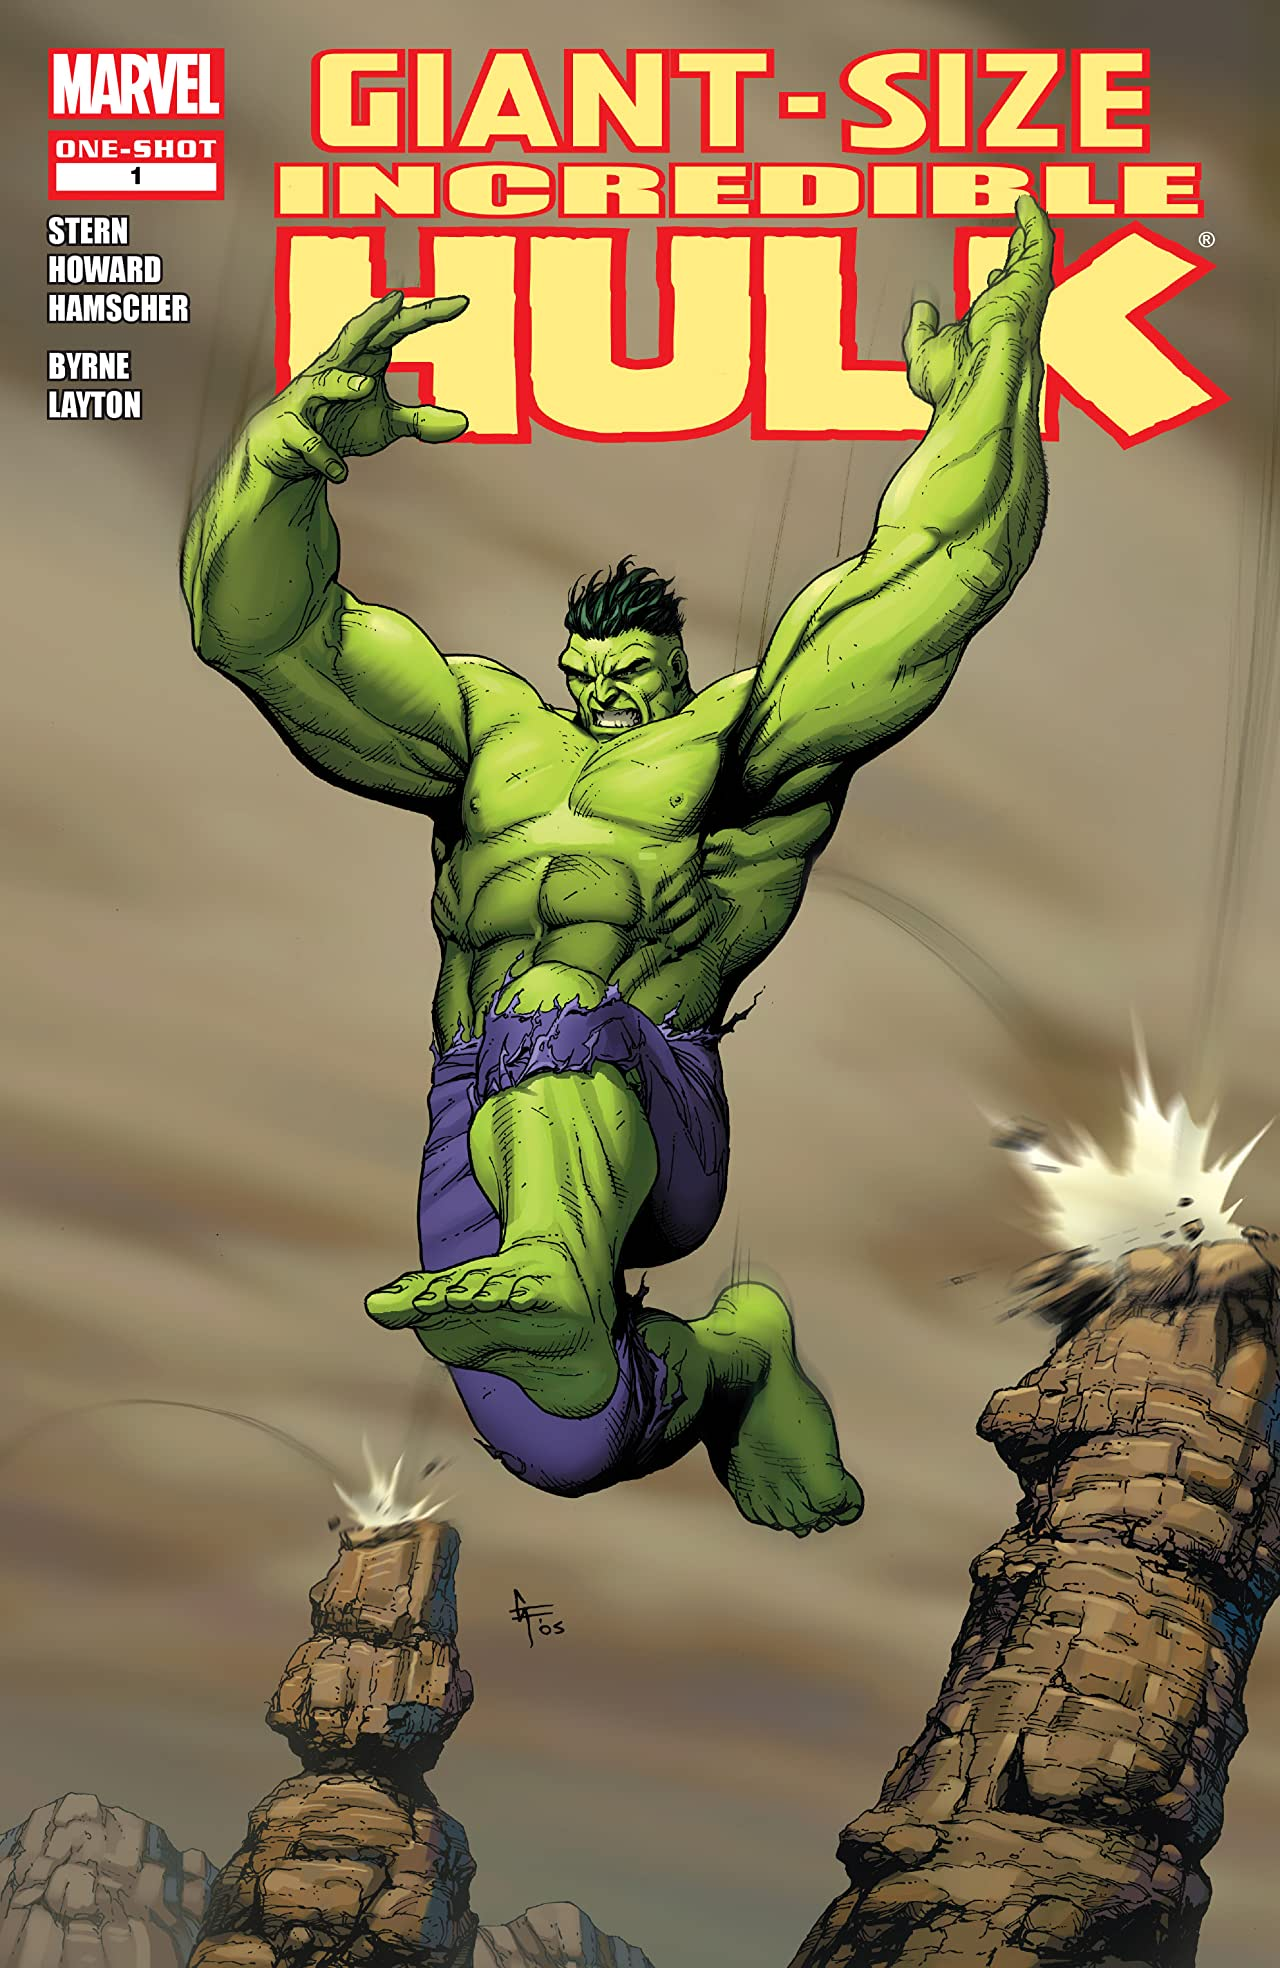 Giant-Size Incredible Hulk Vol 1 1